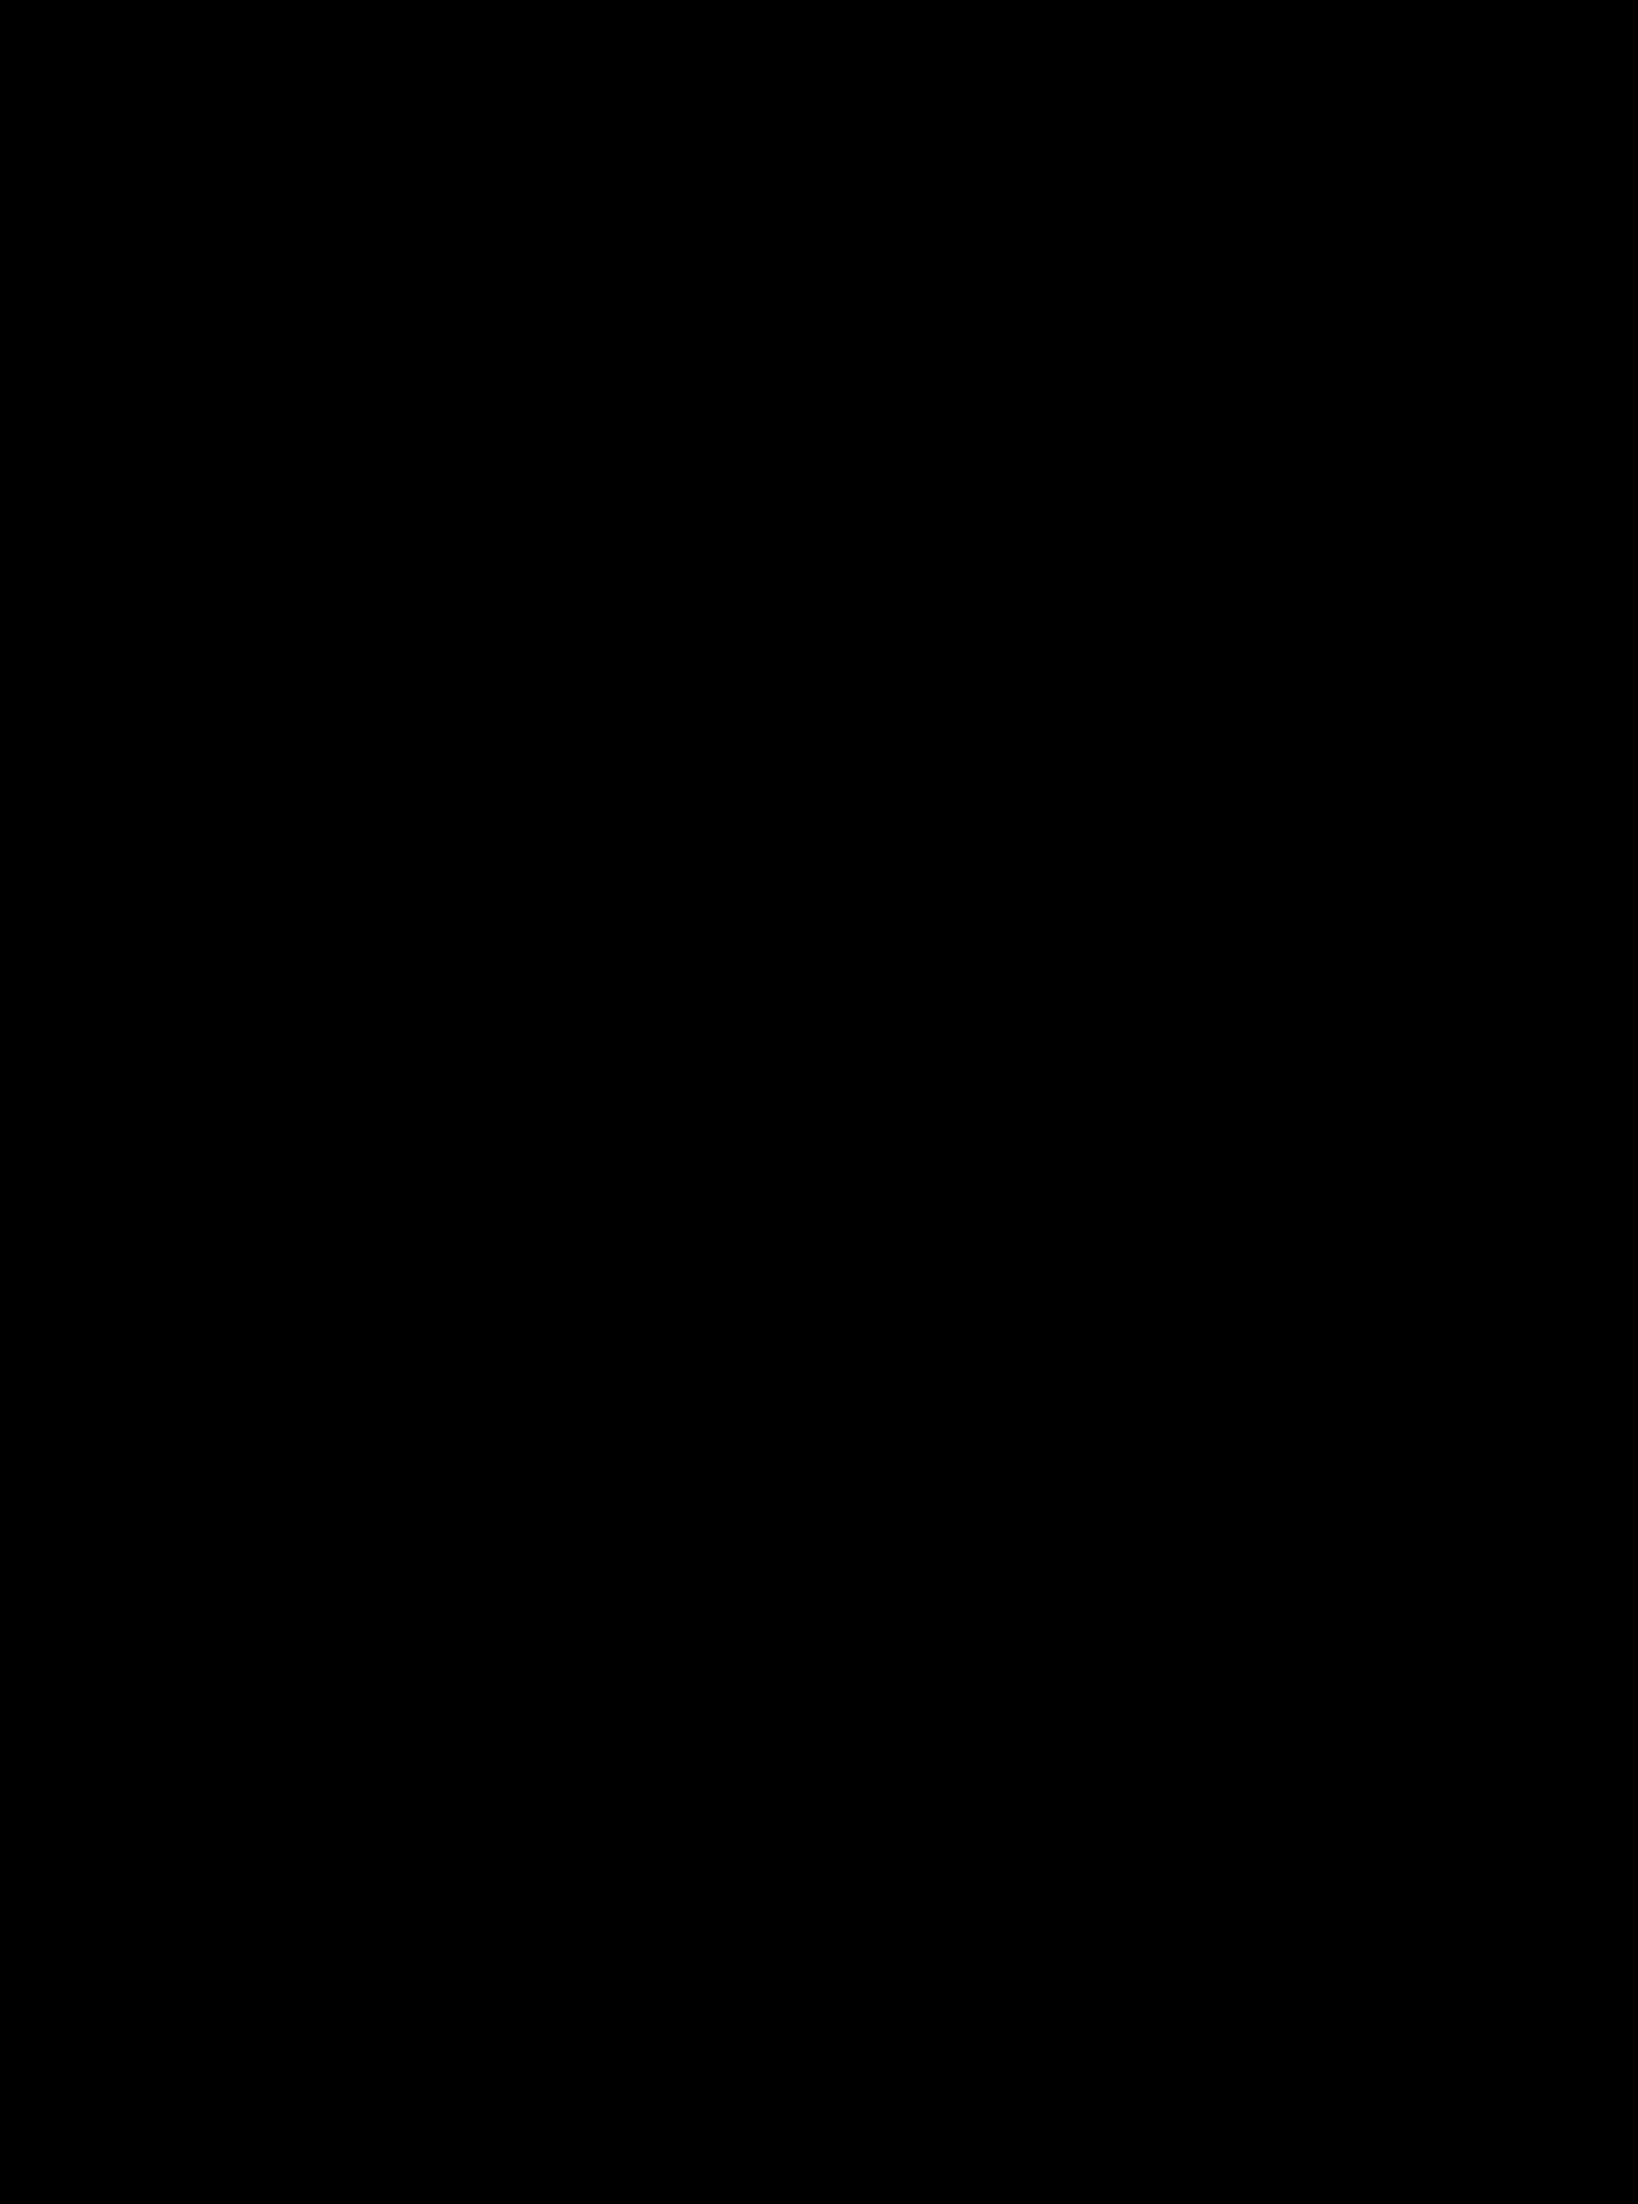 1638x2204 Ballerine Clipart Silhouette